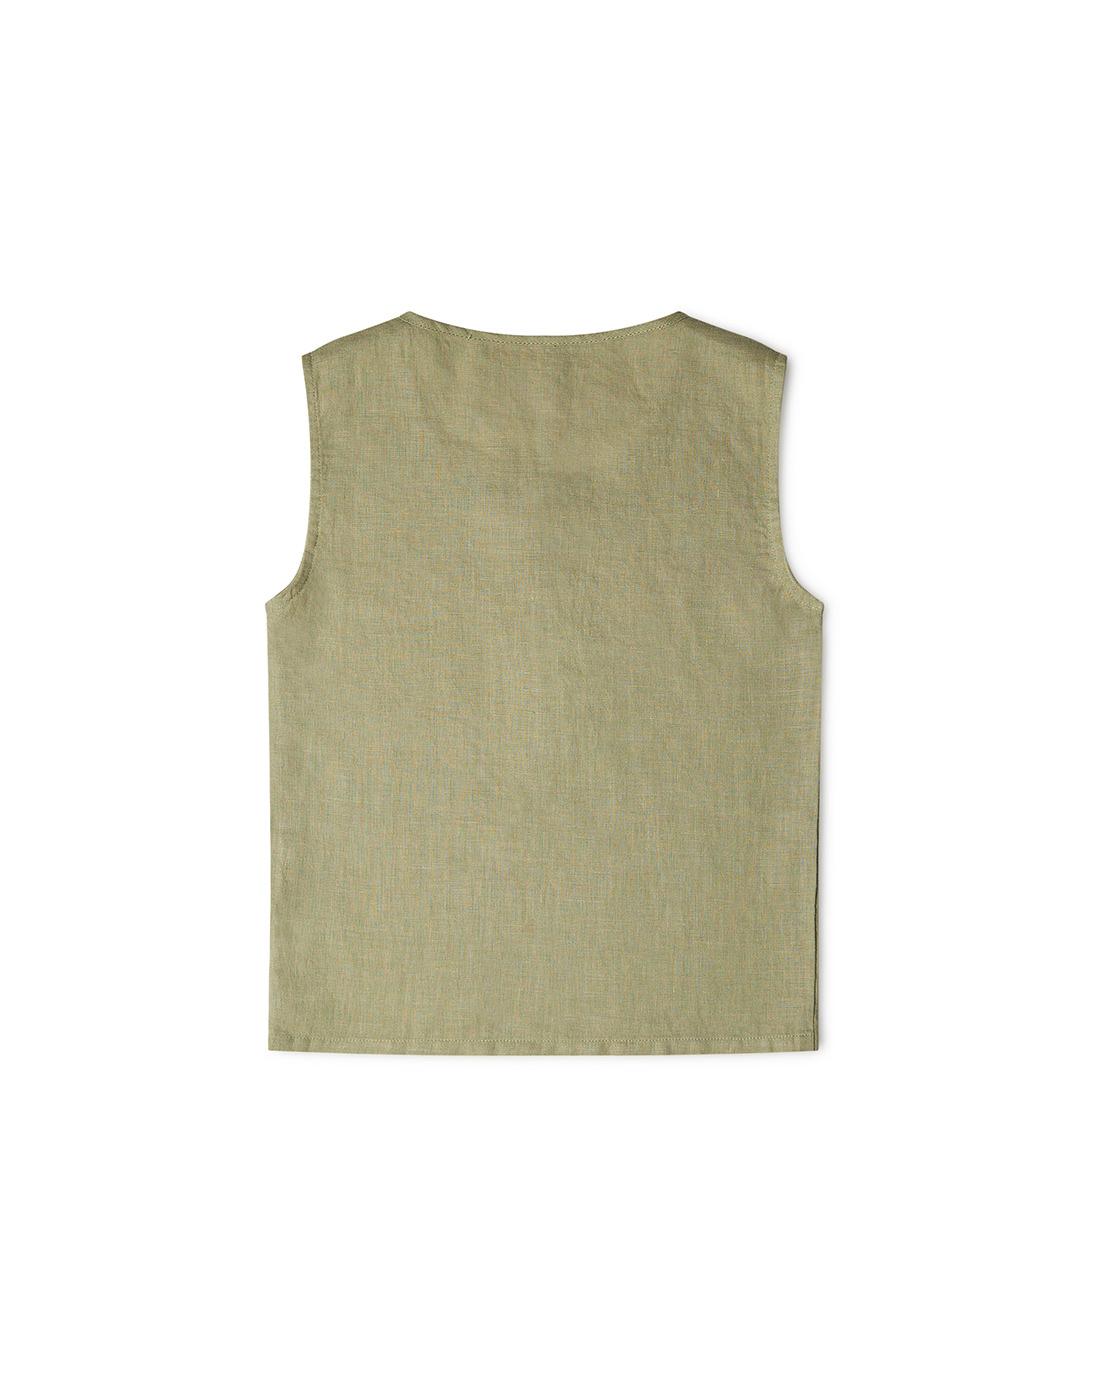 Matona - linen tantkop FAWN - 100% linen - sage - 1 to 6 years